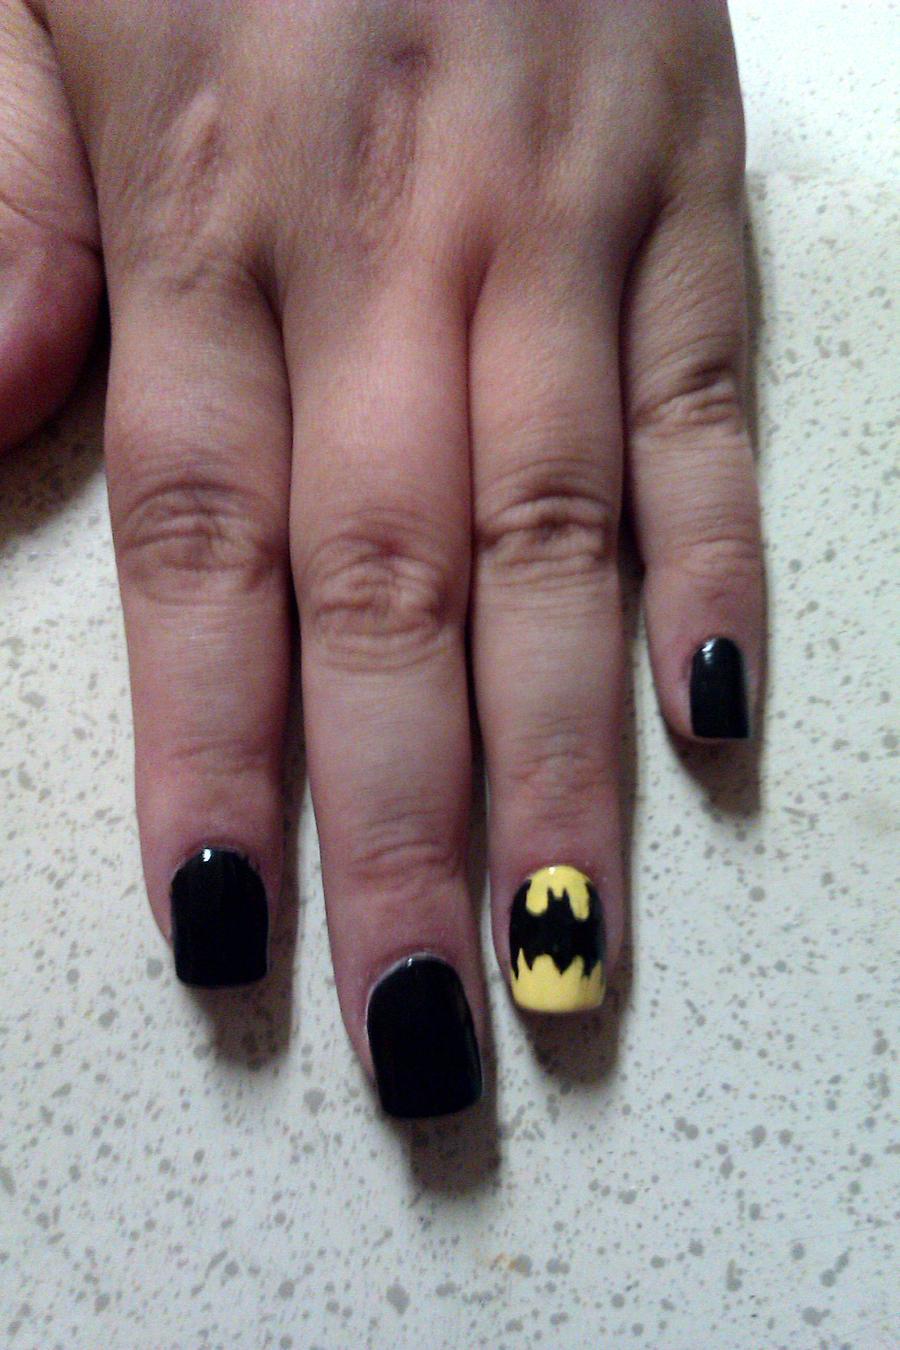 Batman nail art by vstar06 on deviantart batman nail art by vstar06 batman nail art by vstar06 prinsesfo Image collections